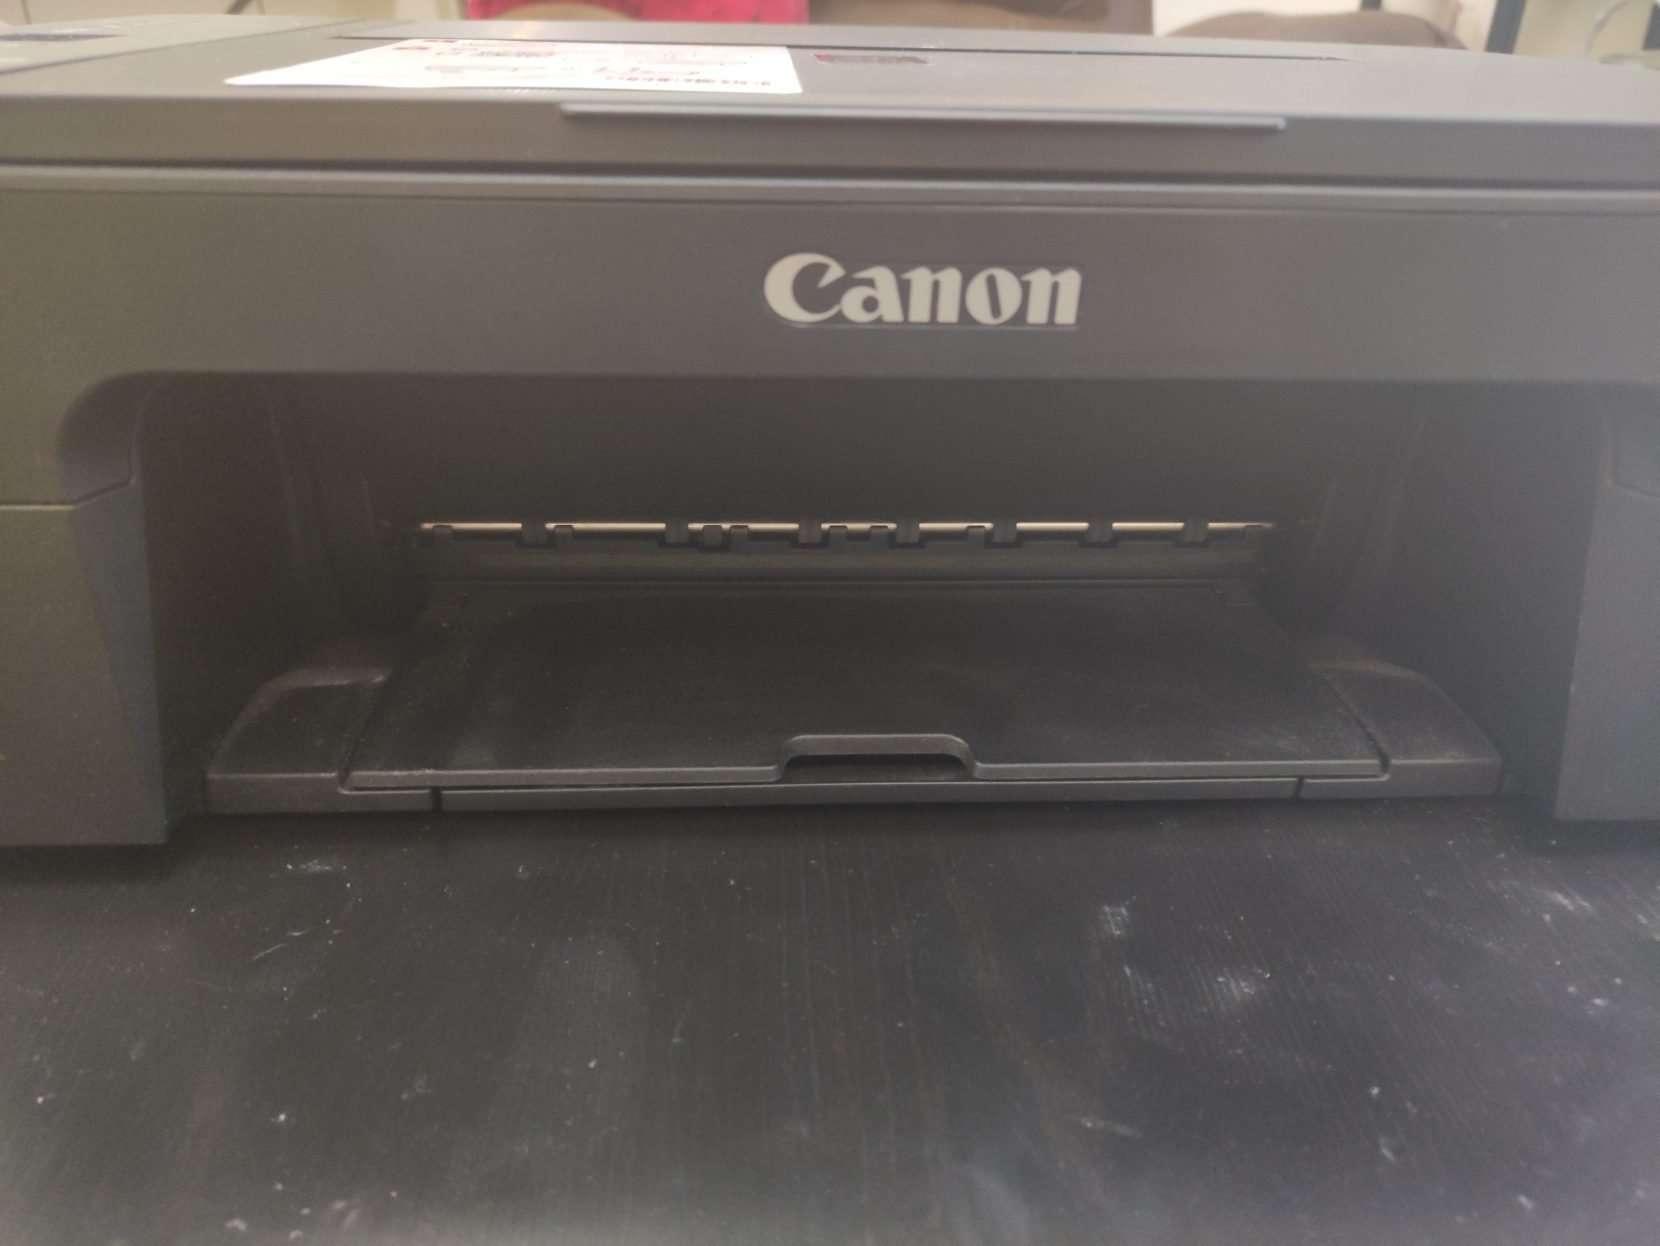 Canon TS3340 Printer Scanner Copier